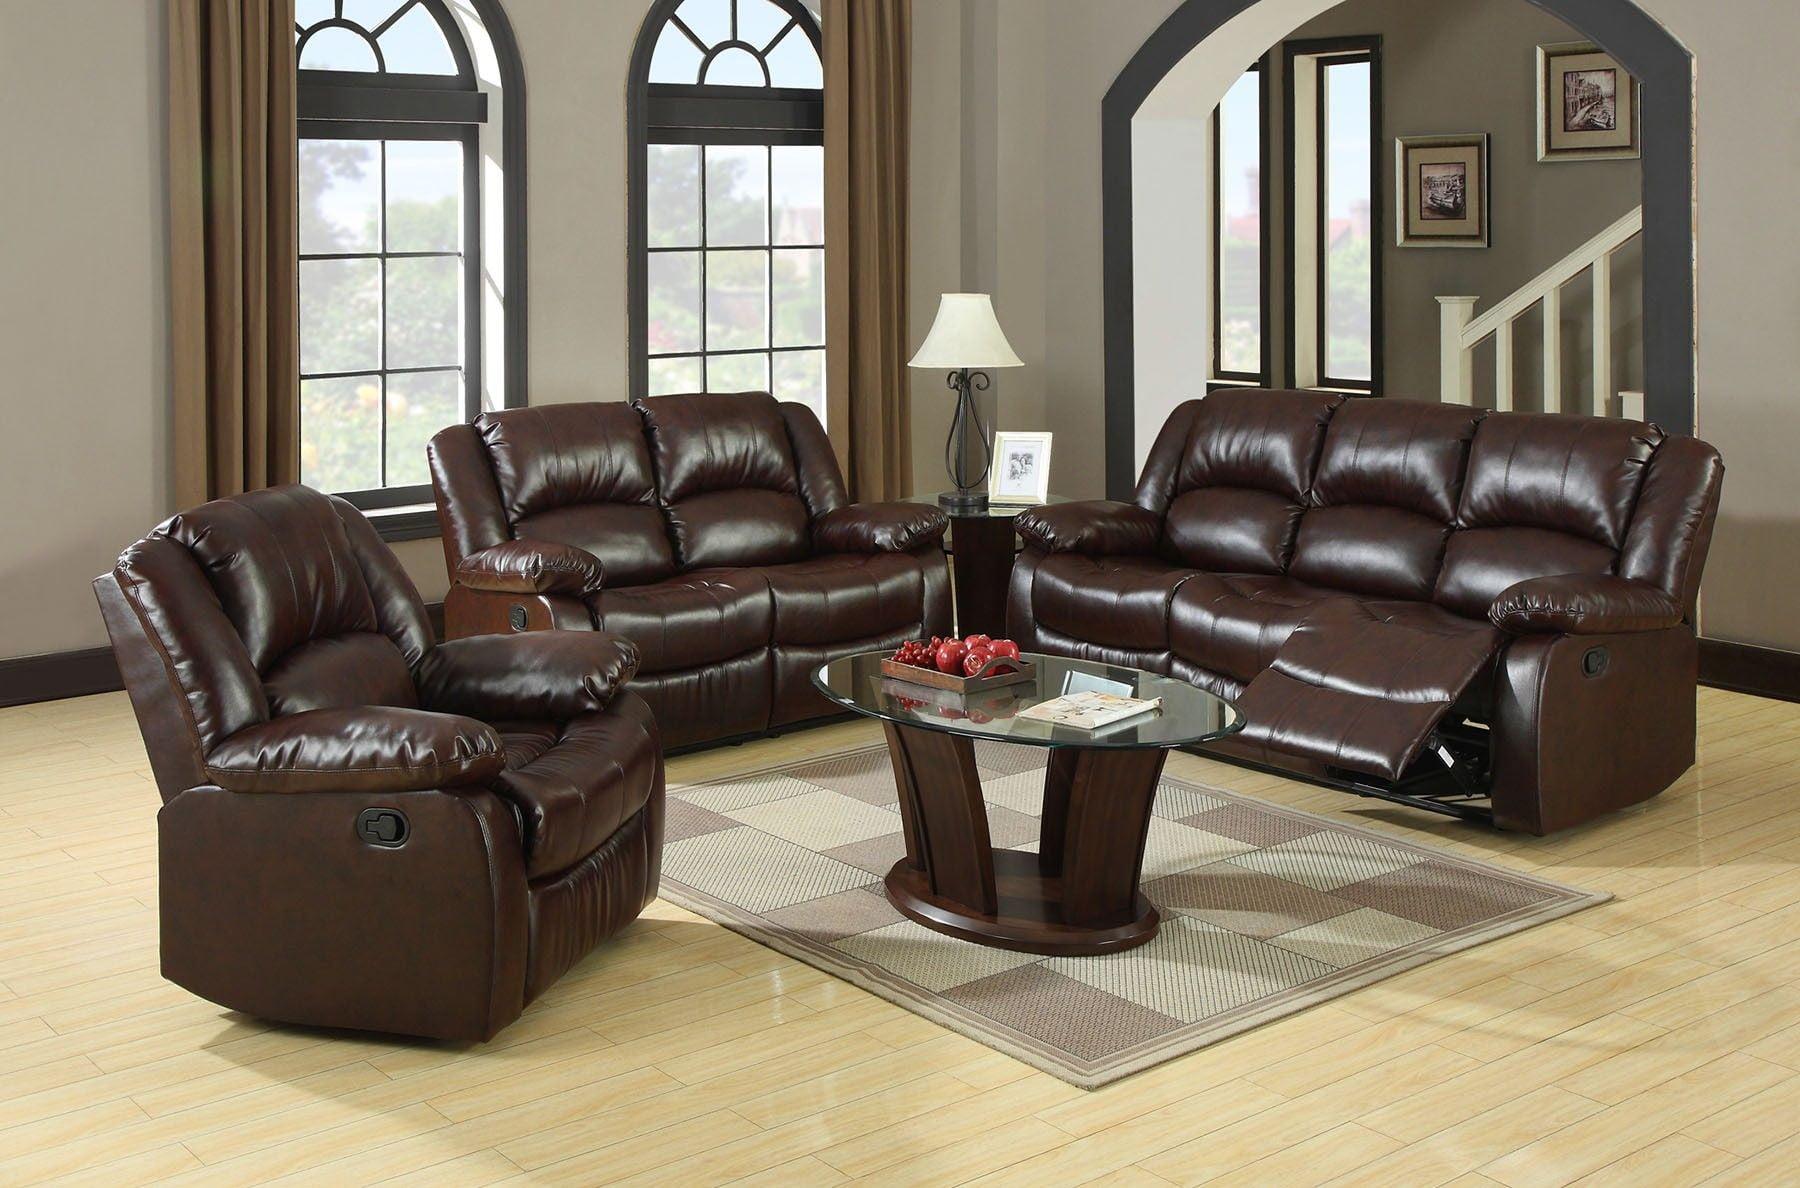 Winslow Rustic Brown Reclining Living Room Set